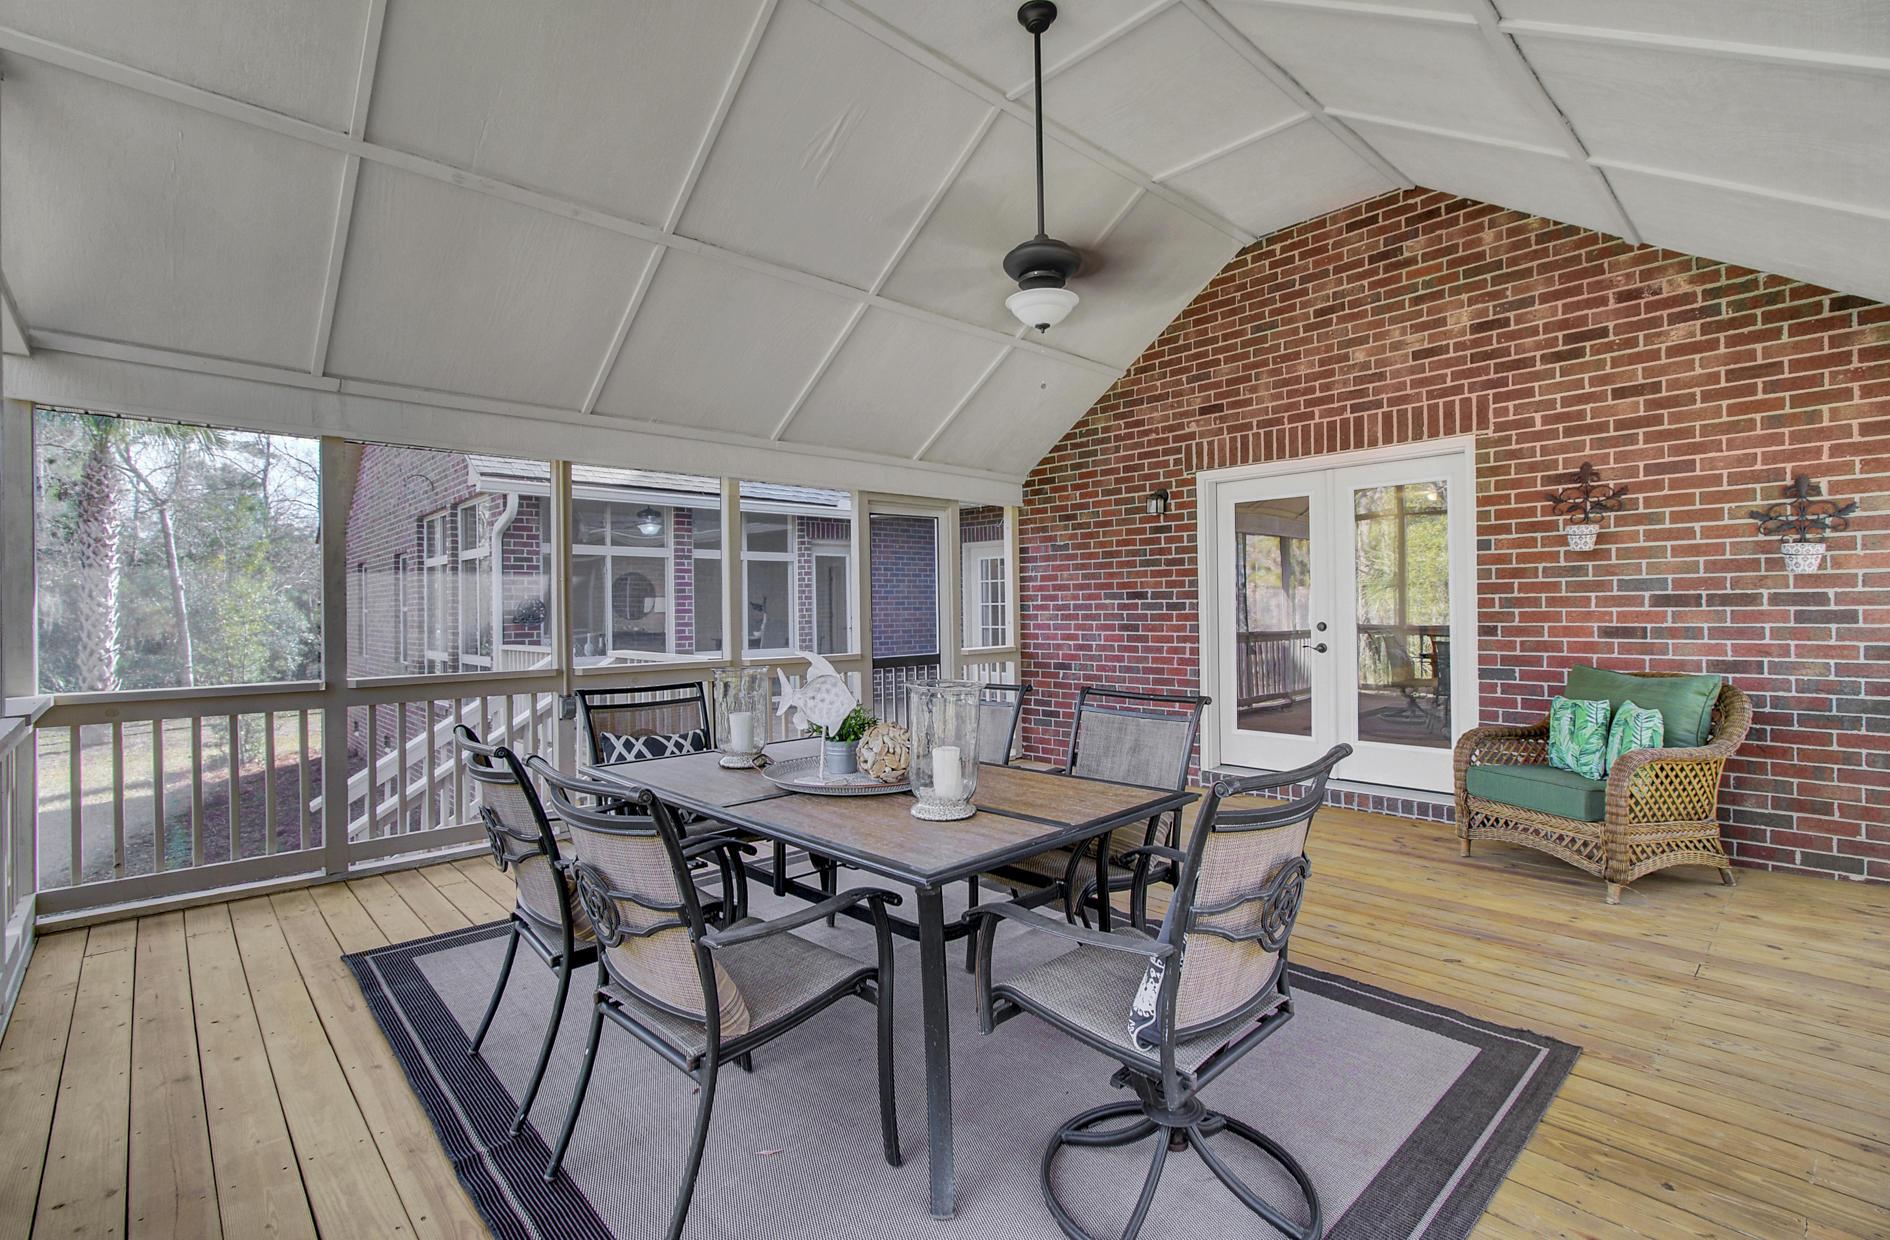 Dunes West Homes For Sale - 4123 Colonel Vanderhorst, Mount Pleasant, SC - 11